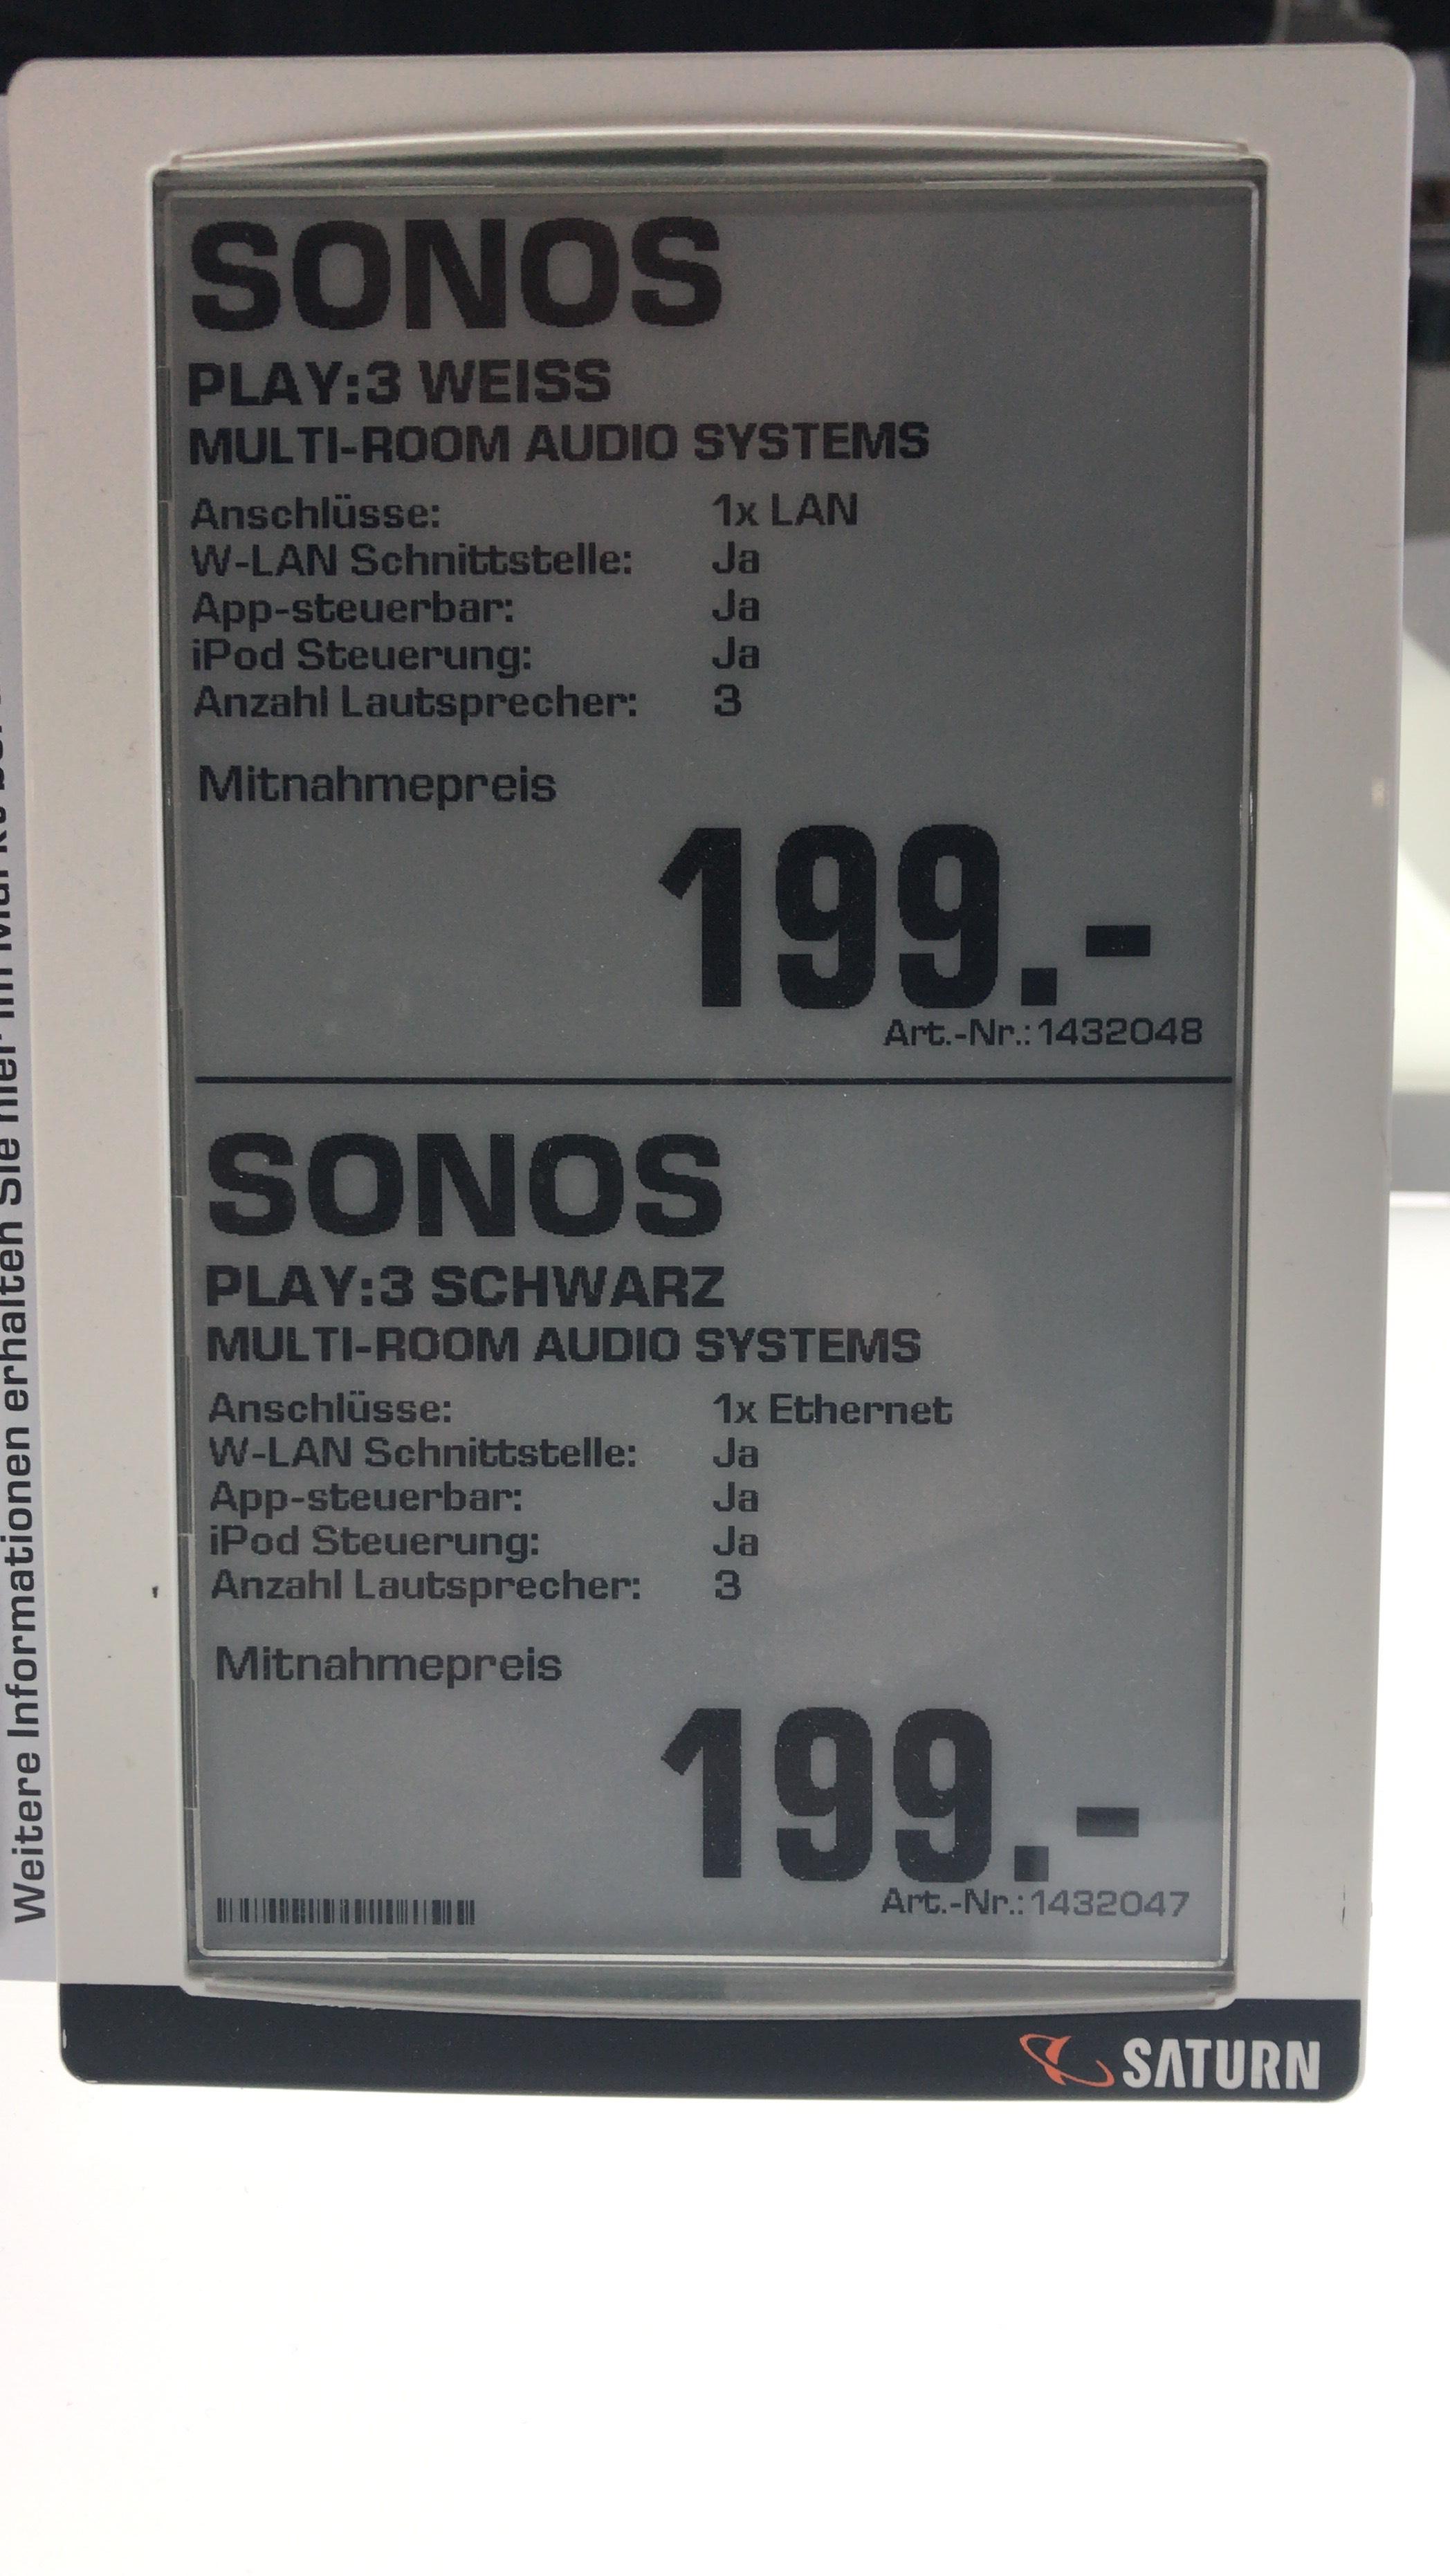 [Lokal: München]SONOS PLAY:3